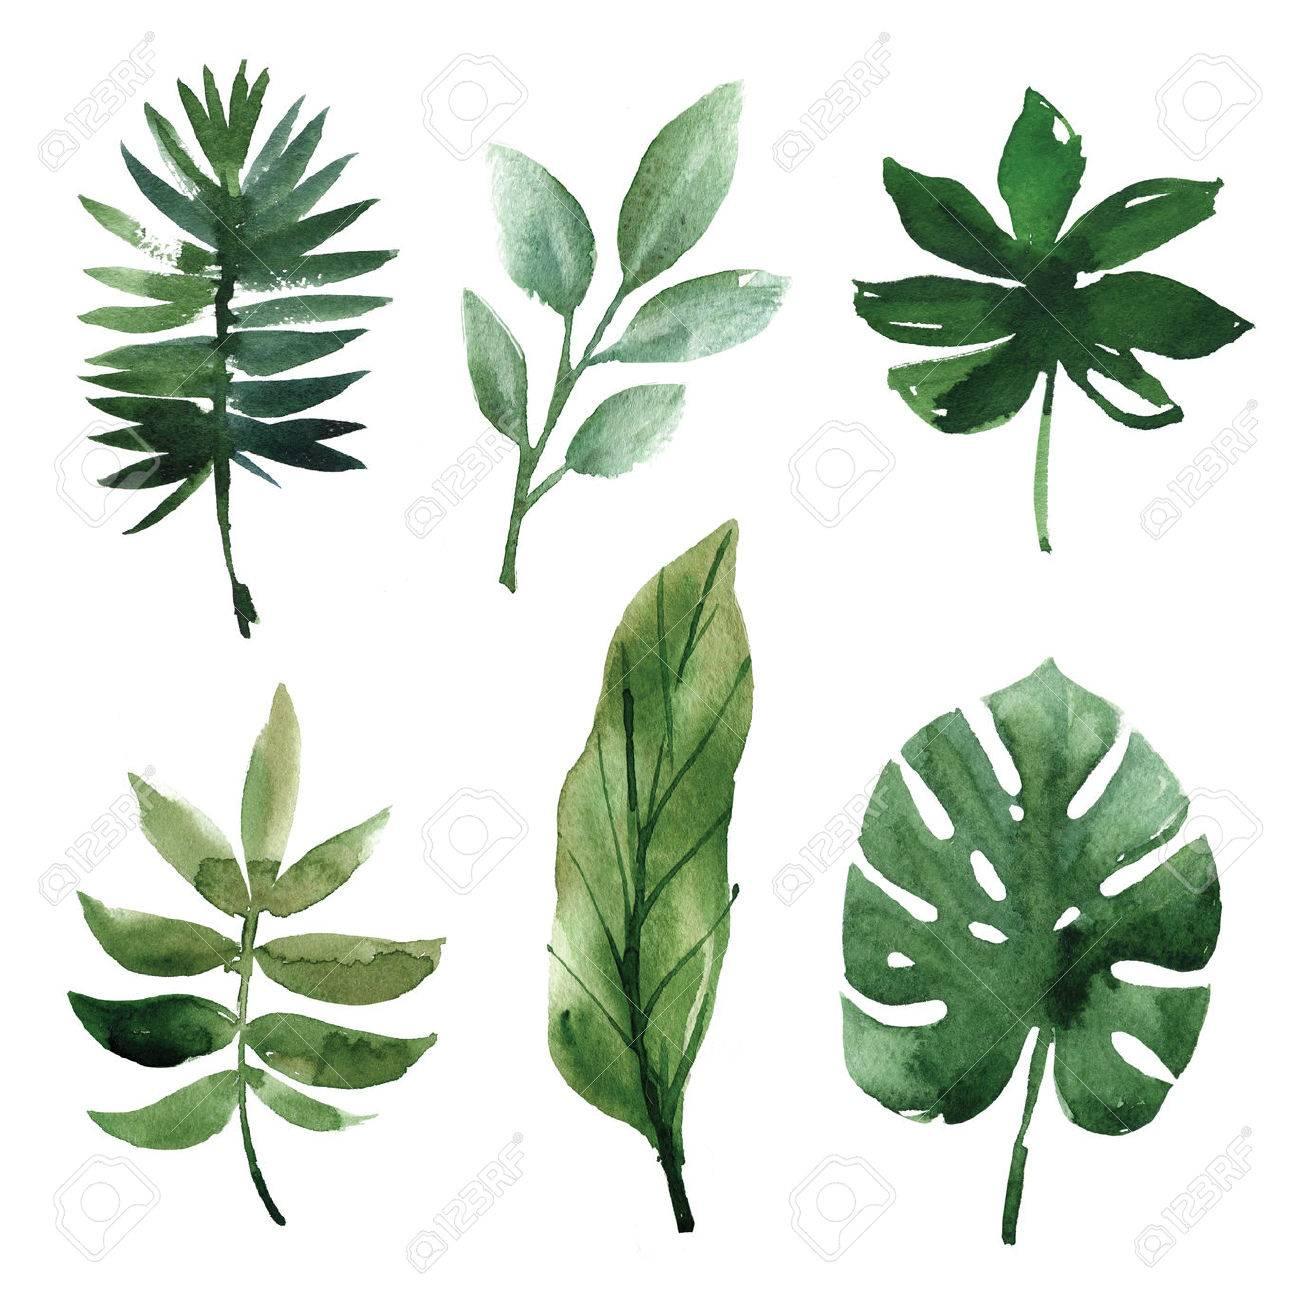 Watercolor tropical leaves - 56756357